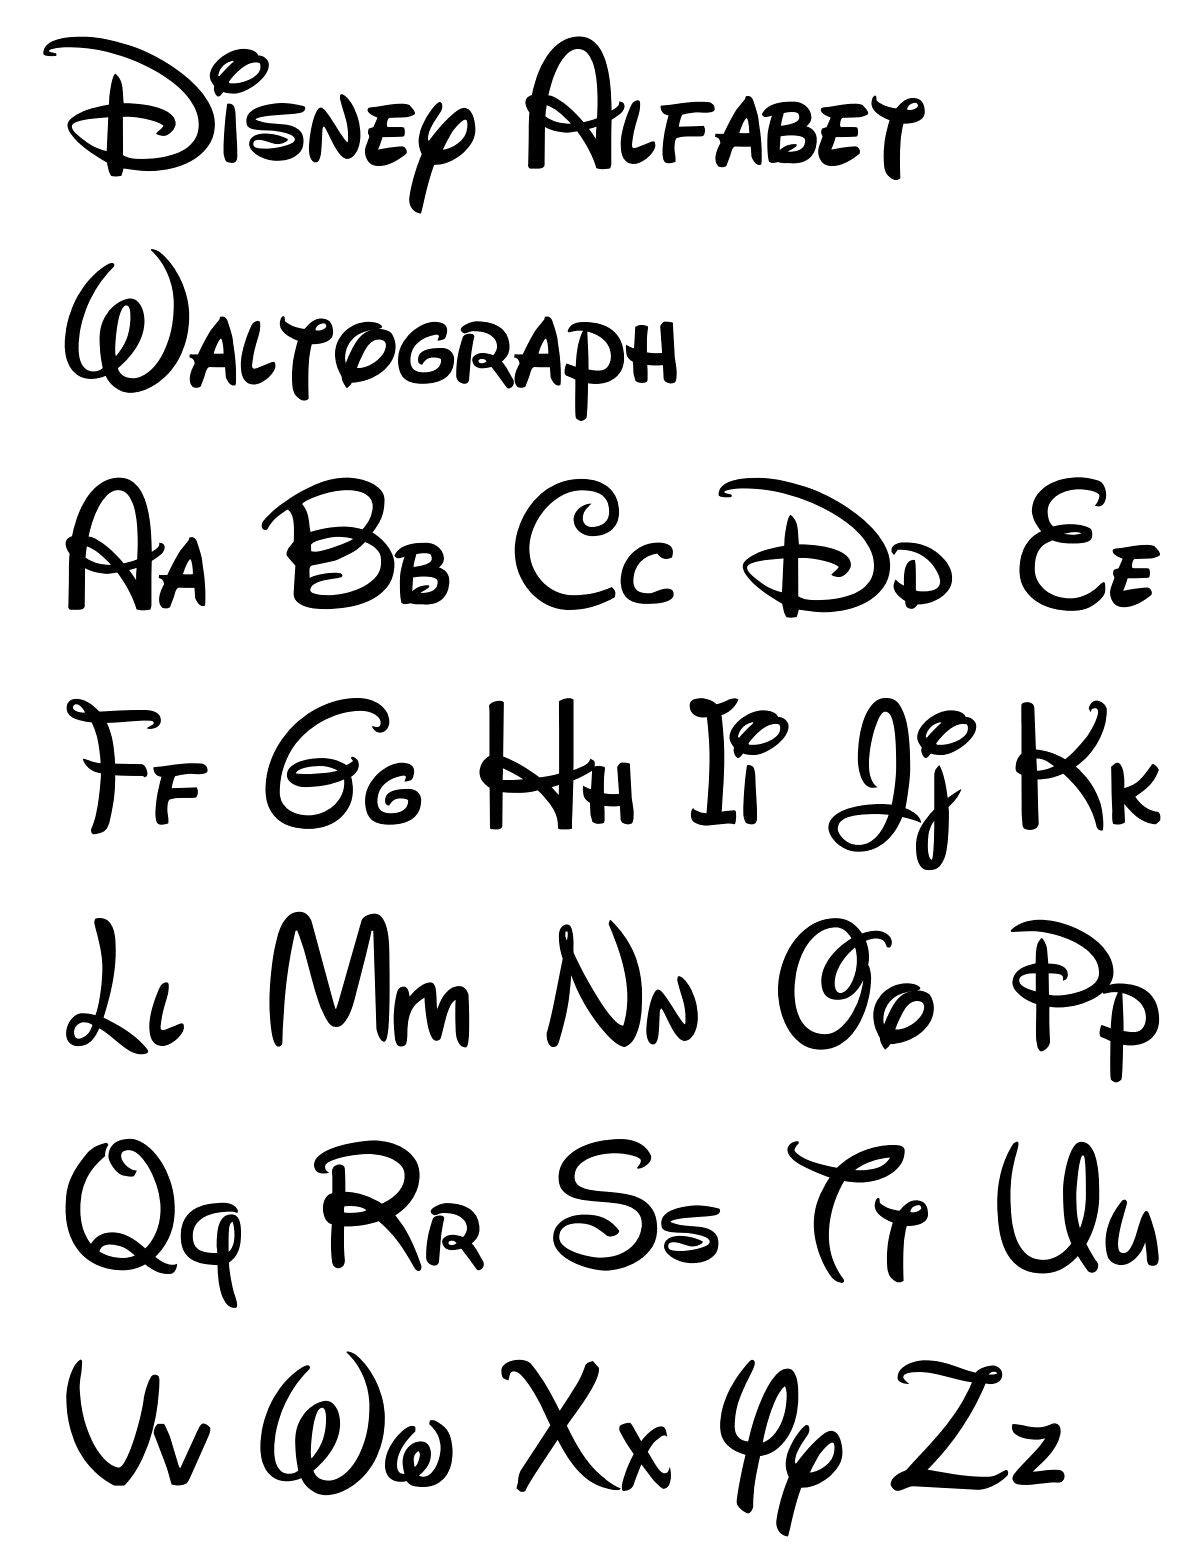 Free Printable Disney Letter Stencils | Disney | Pinterest - Free Printable Disney Alphabet Letters